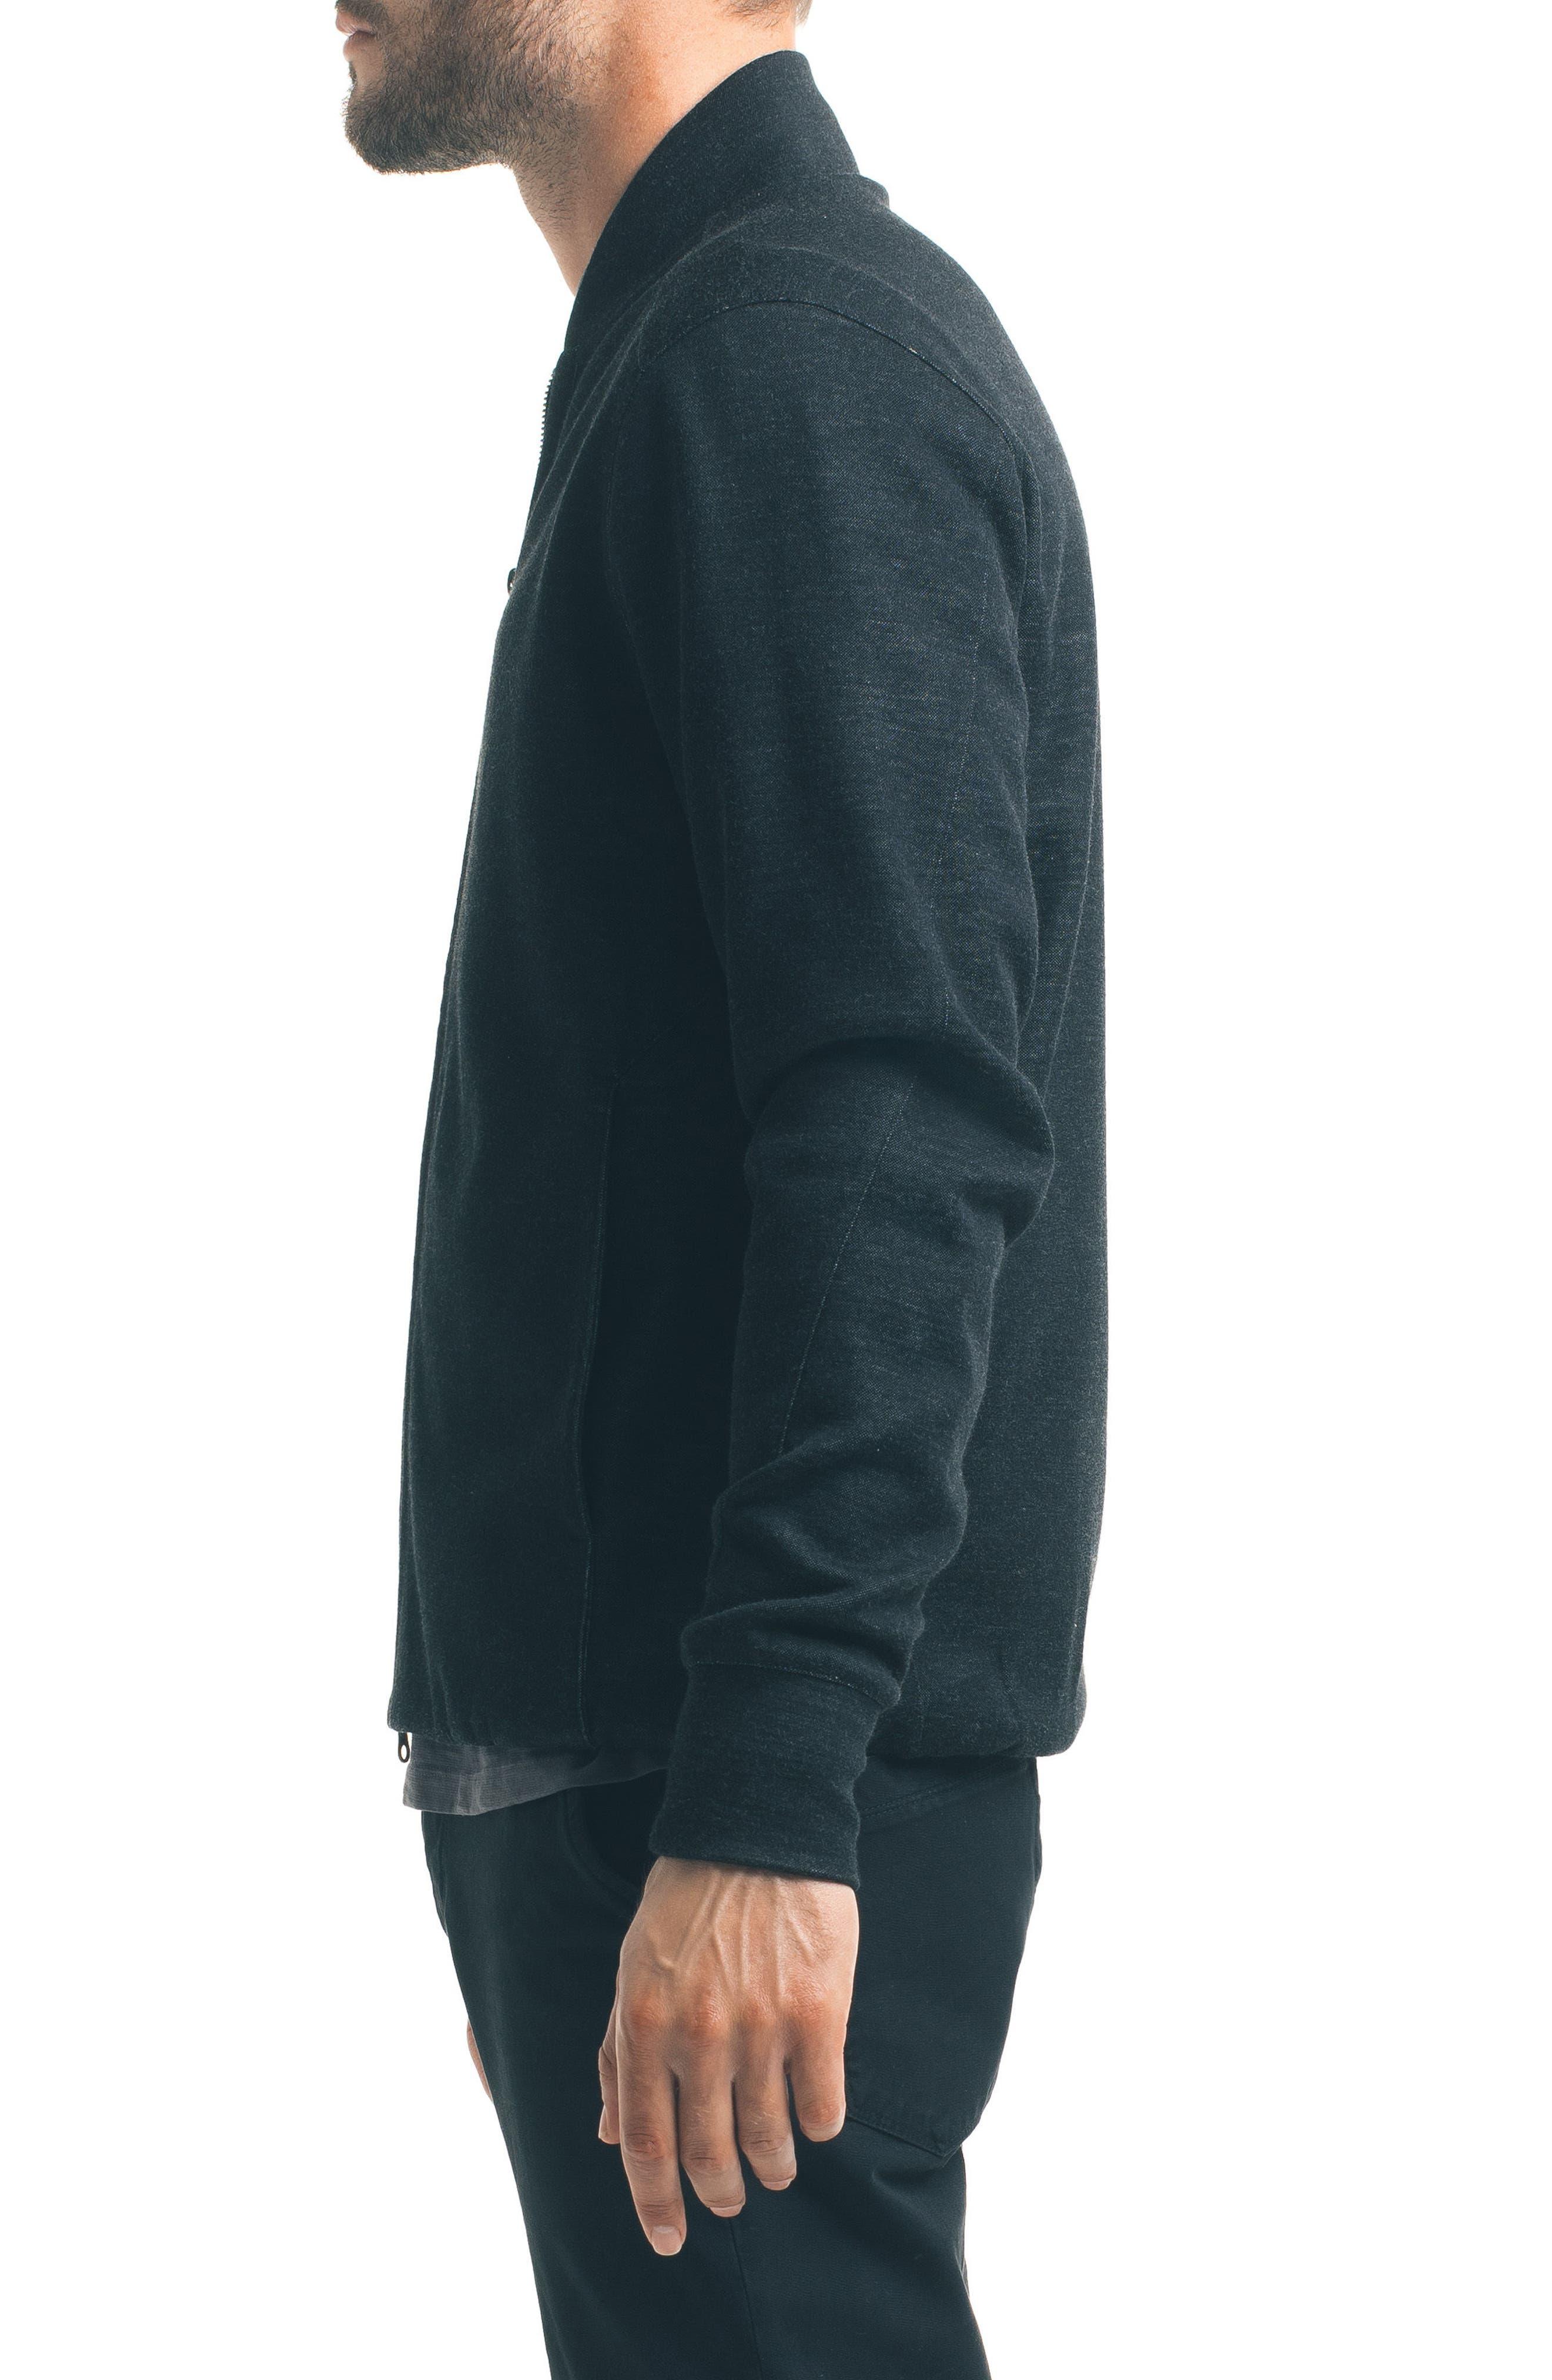 Modern Slim Fit Bomber Jacket,                             Alternate thumbnail 3, color,                             Black